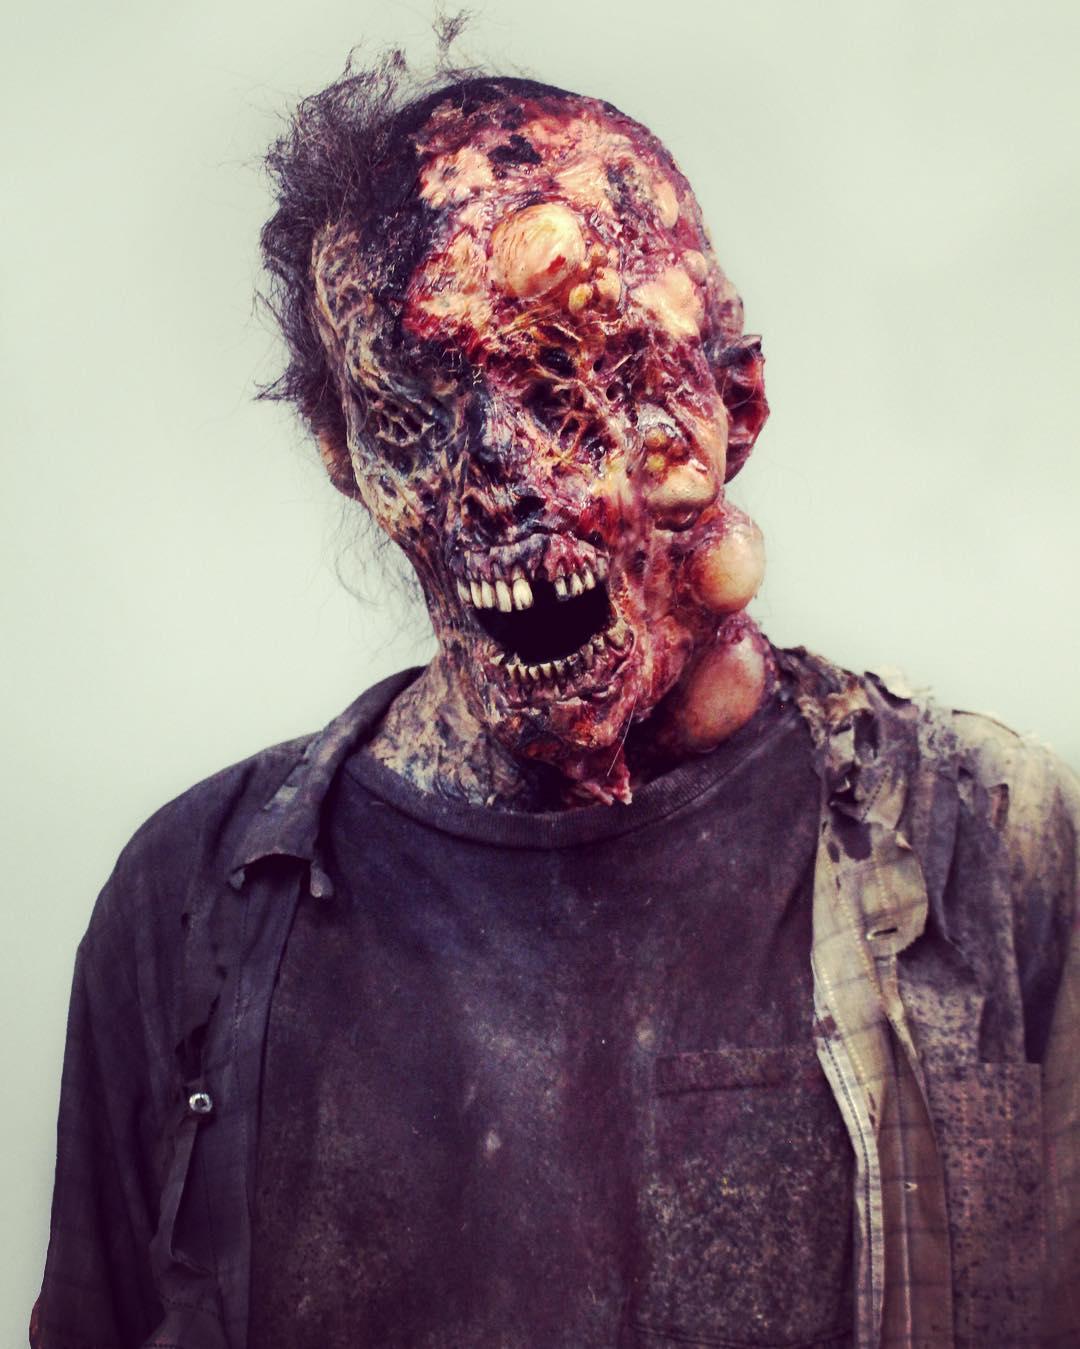 the-walking-dead-7-temporada-grotescos-zumbis-imagens-003